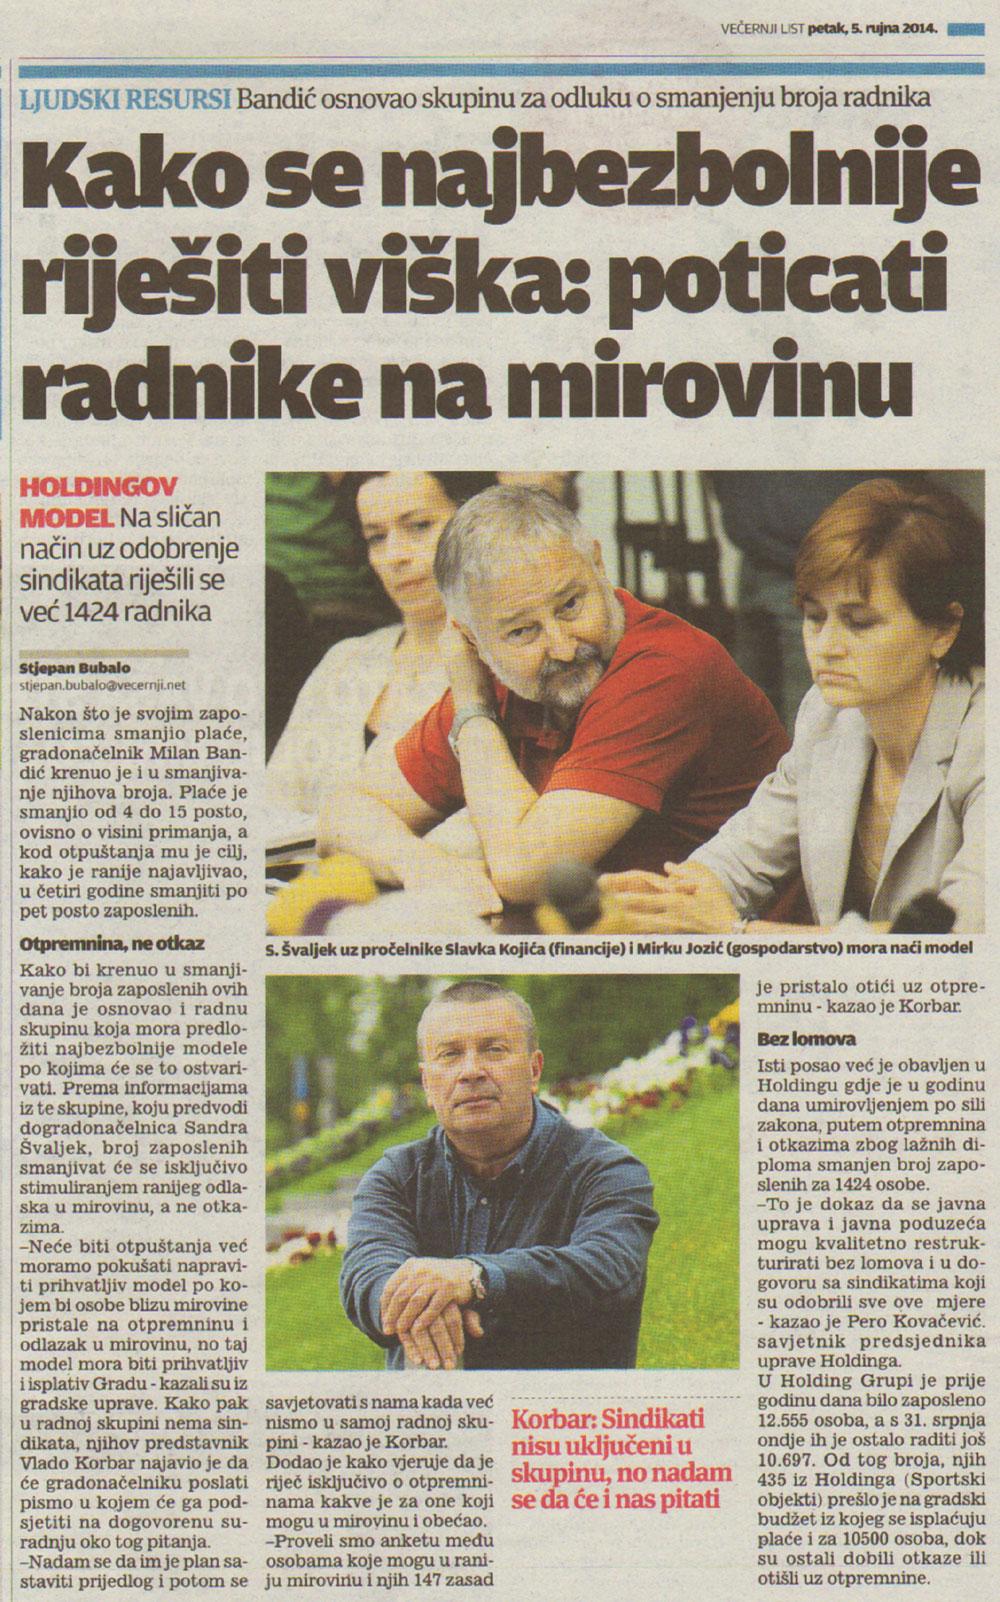 VEČERNJI LIST o zbrinjavanju viška zaposlenih u Gradu Zagrebu